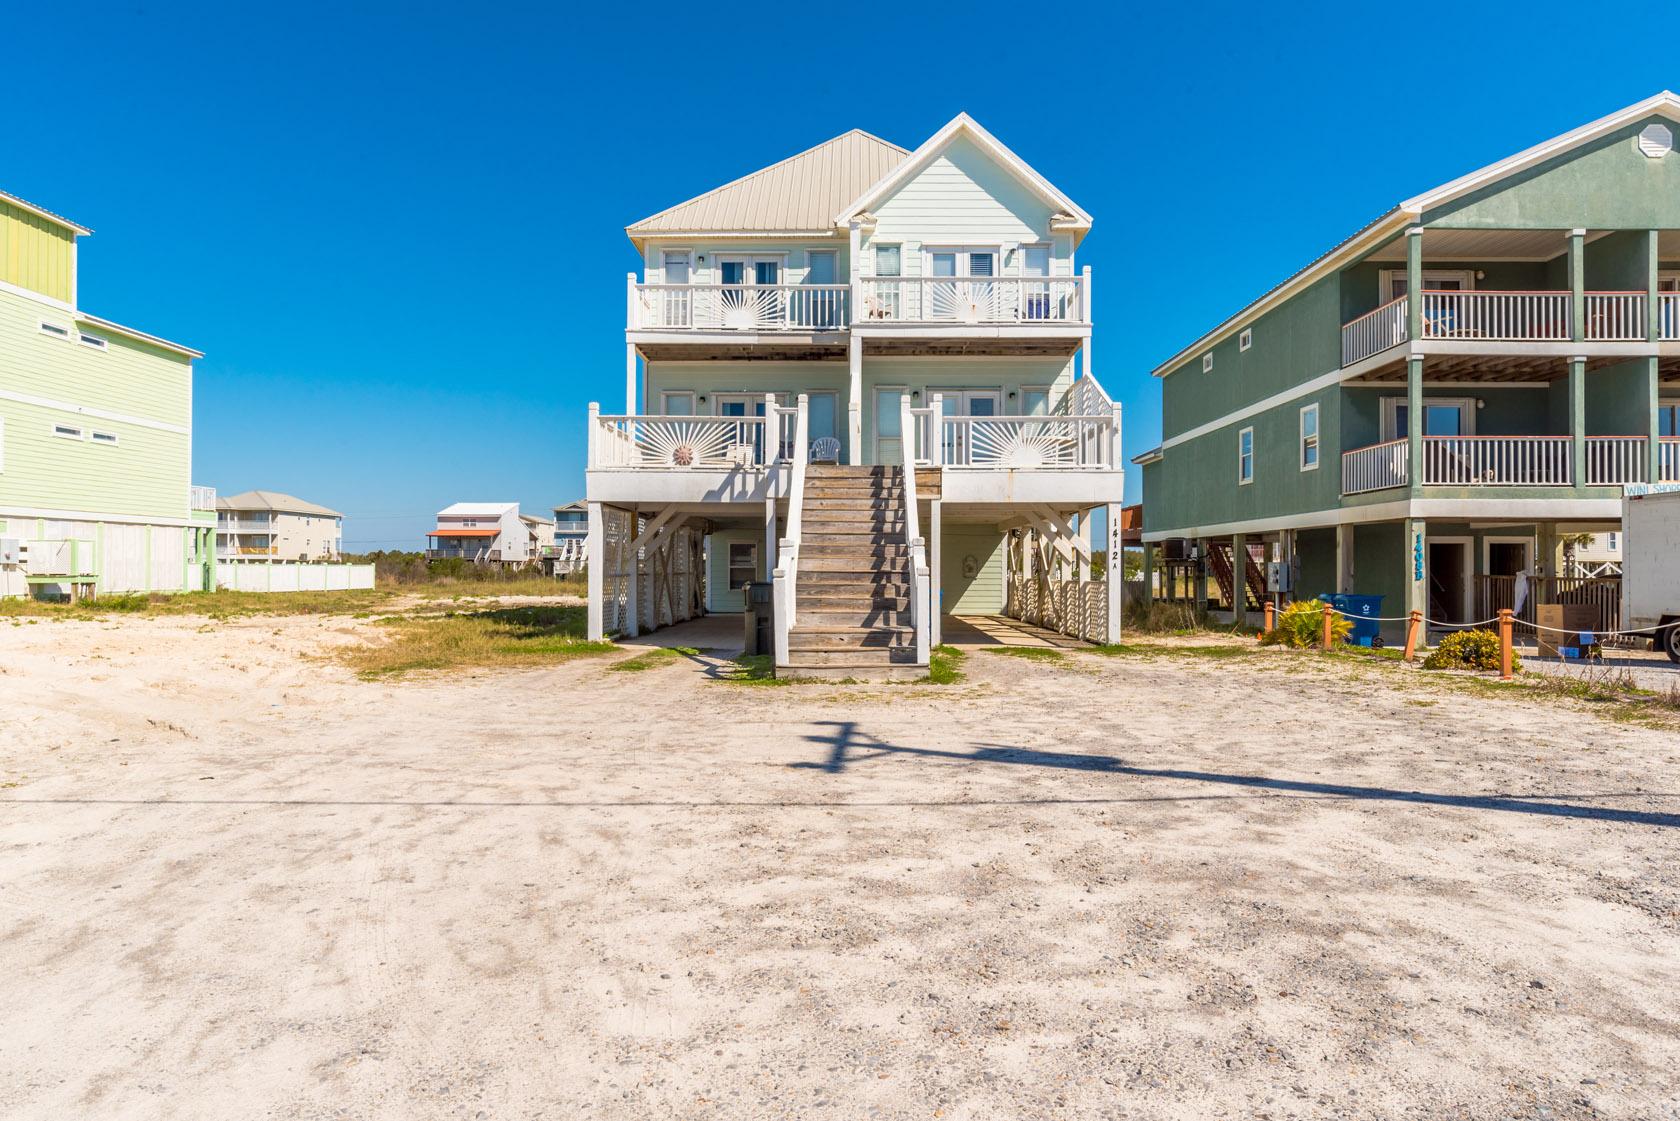 Gulf shores duplex condo investments jason will real estate mobile county real estate for 3 bedroom condos in gulf shores al